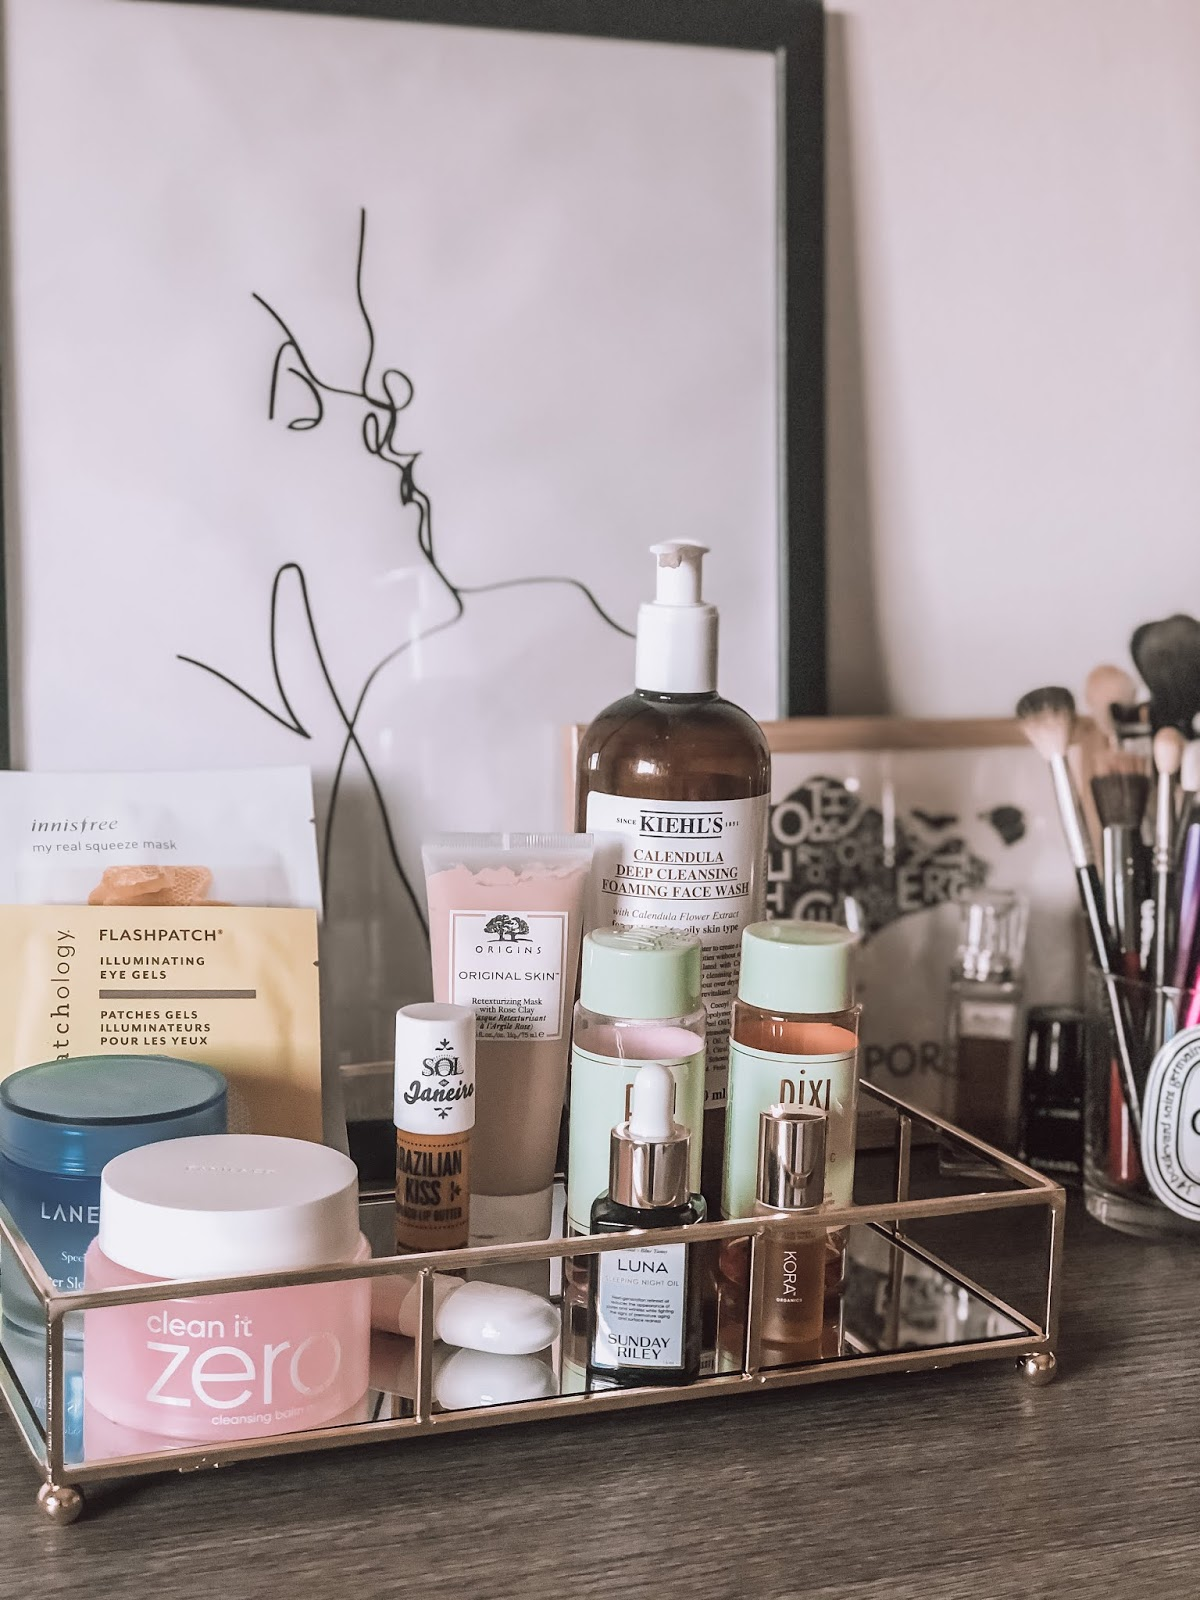 2019 best skincare, pixi, sunday riley, kiko, kora, innisfree, kiehls, laneige